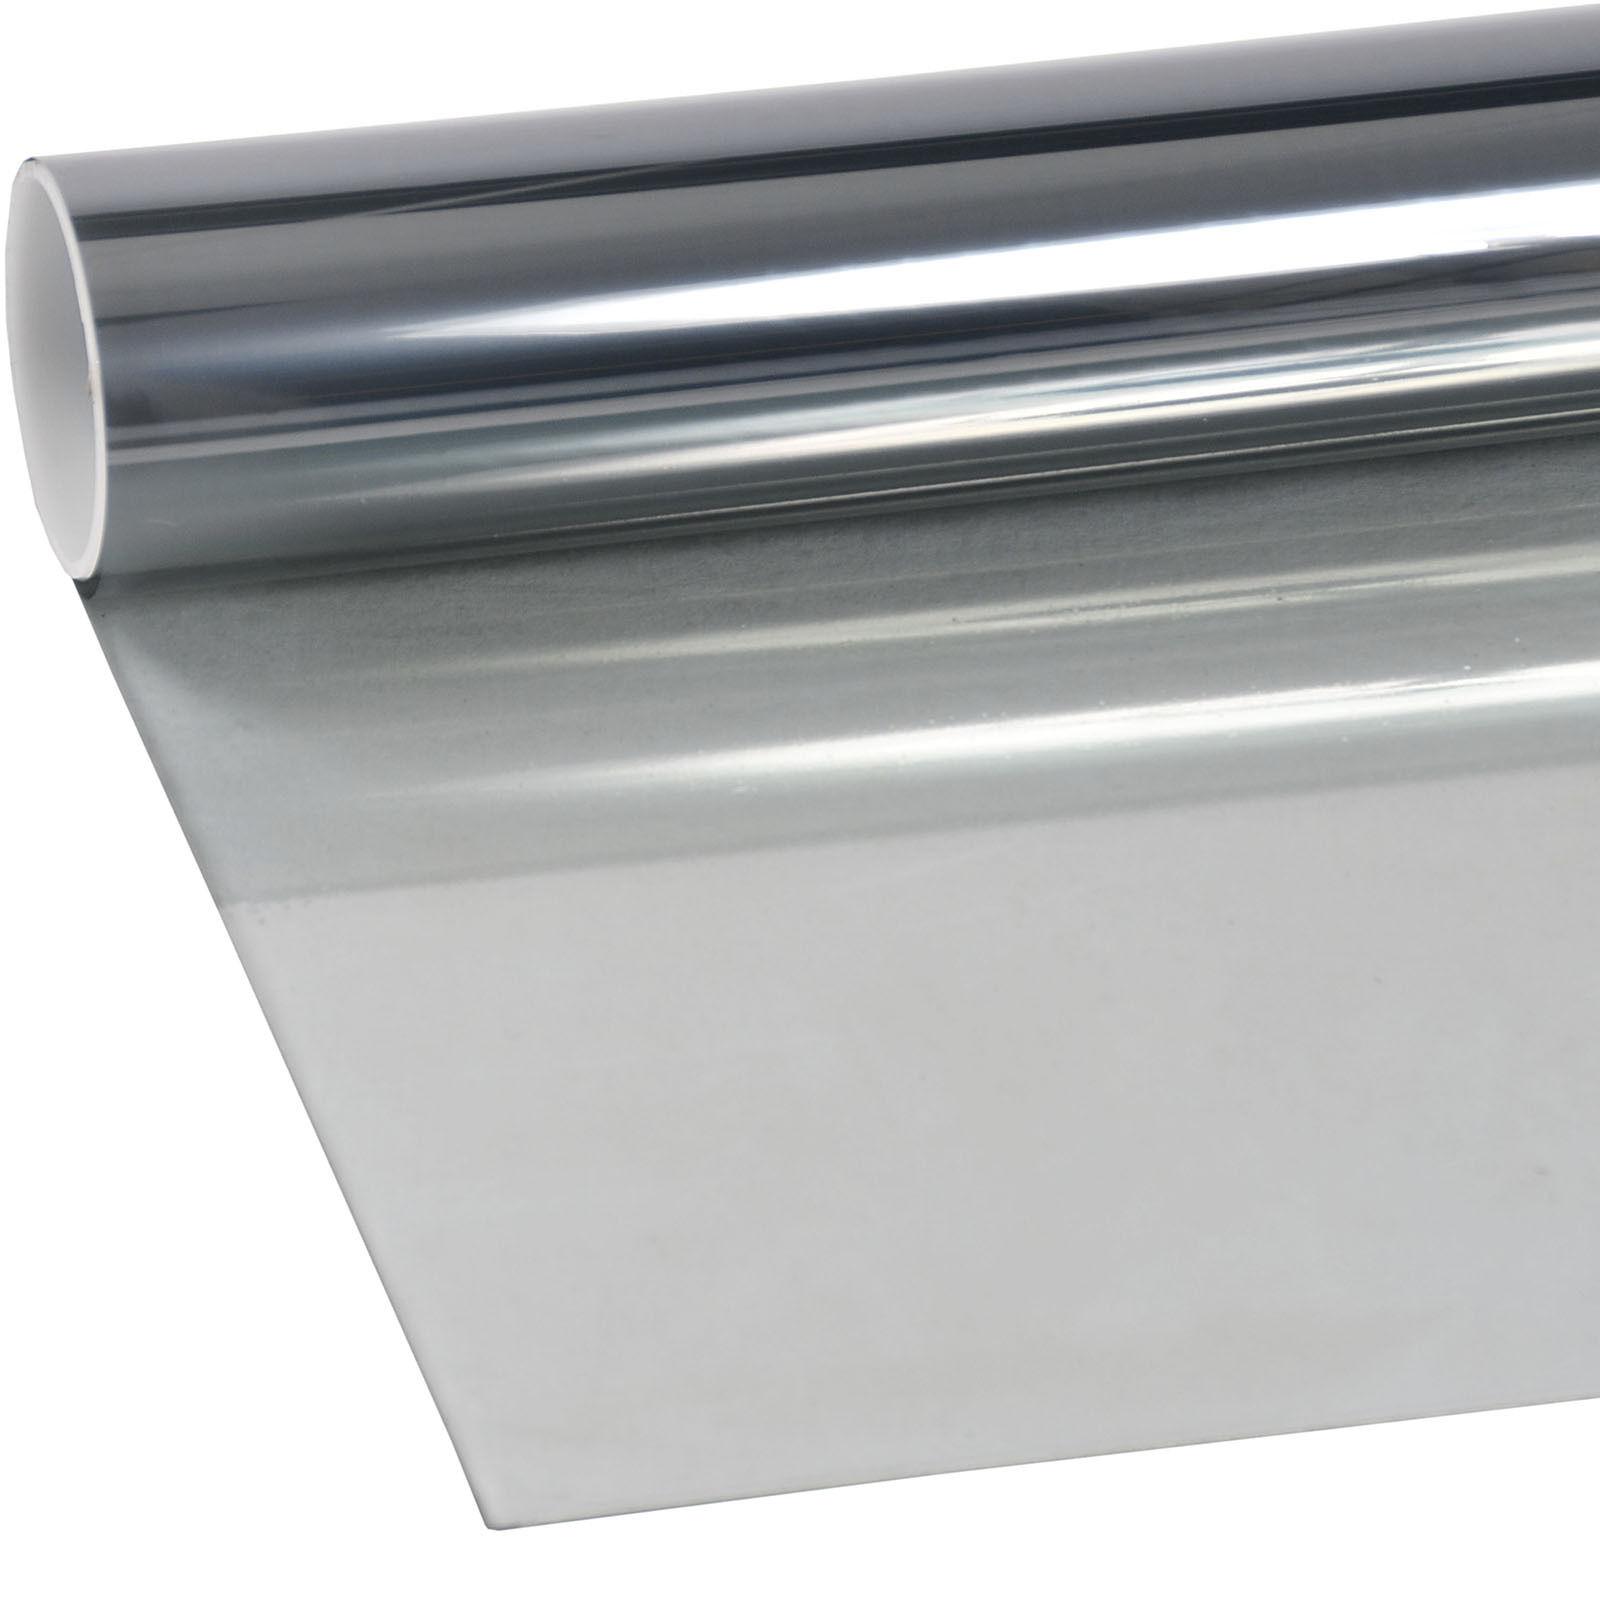 Clear Sticky Back Plastic Emergency Glass Safety Repair Window Film 76cm x 4m